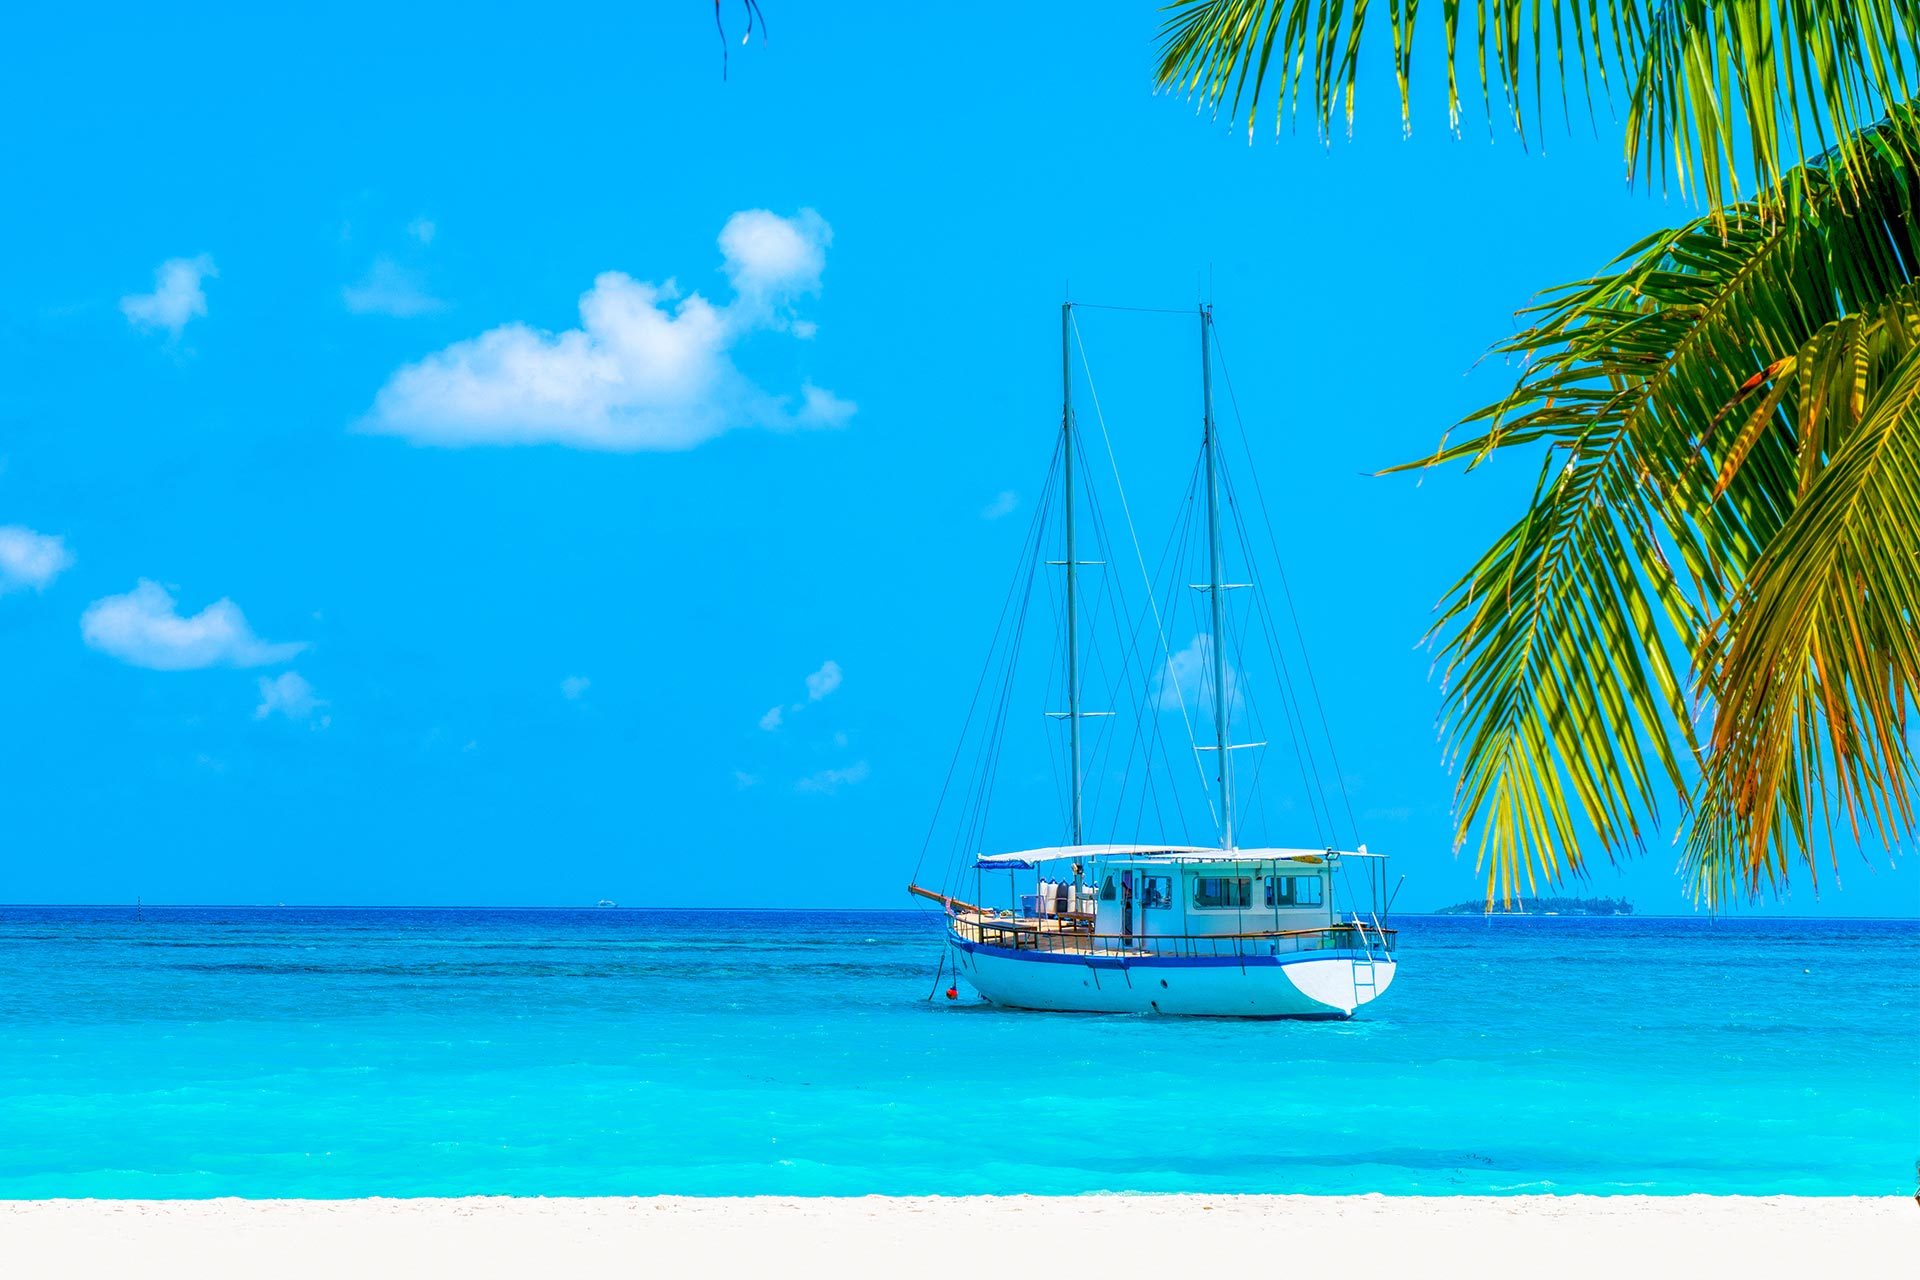 Sejur plaja Maldive, 12 zile - ianuarie 2021